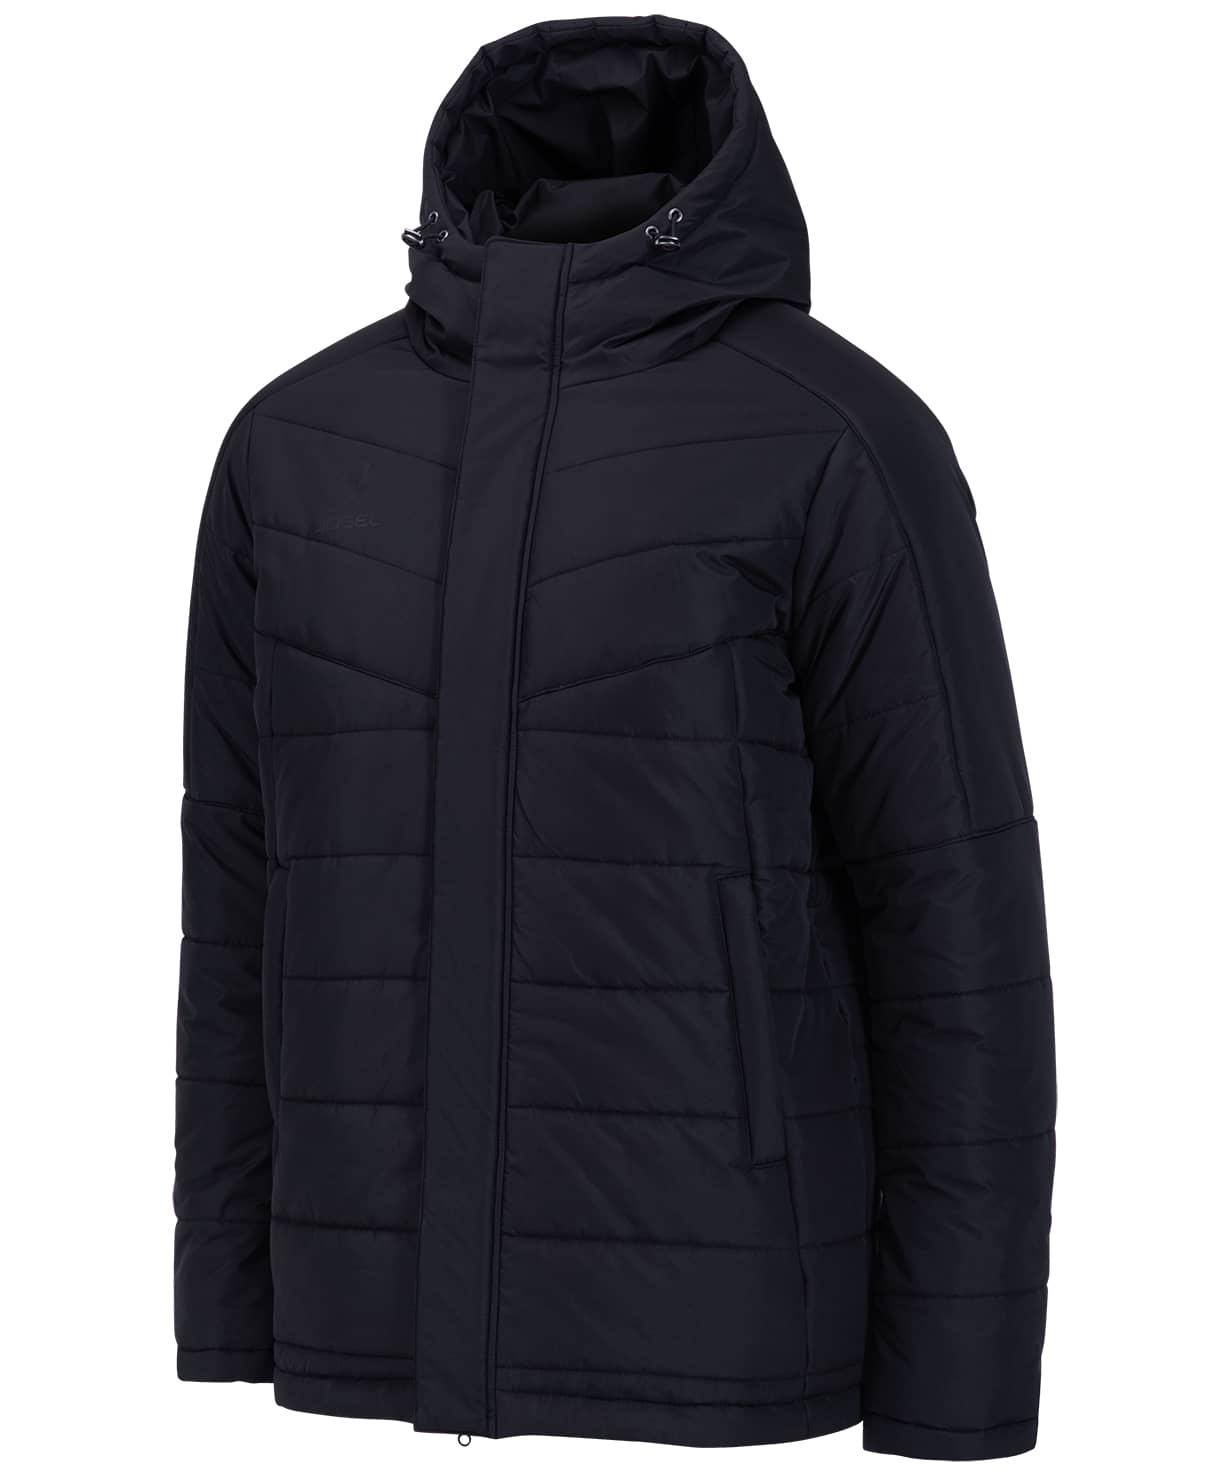 Куртка утепленная CAMP Padded Jacket, черный